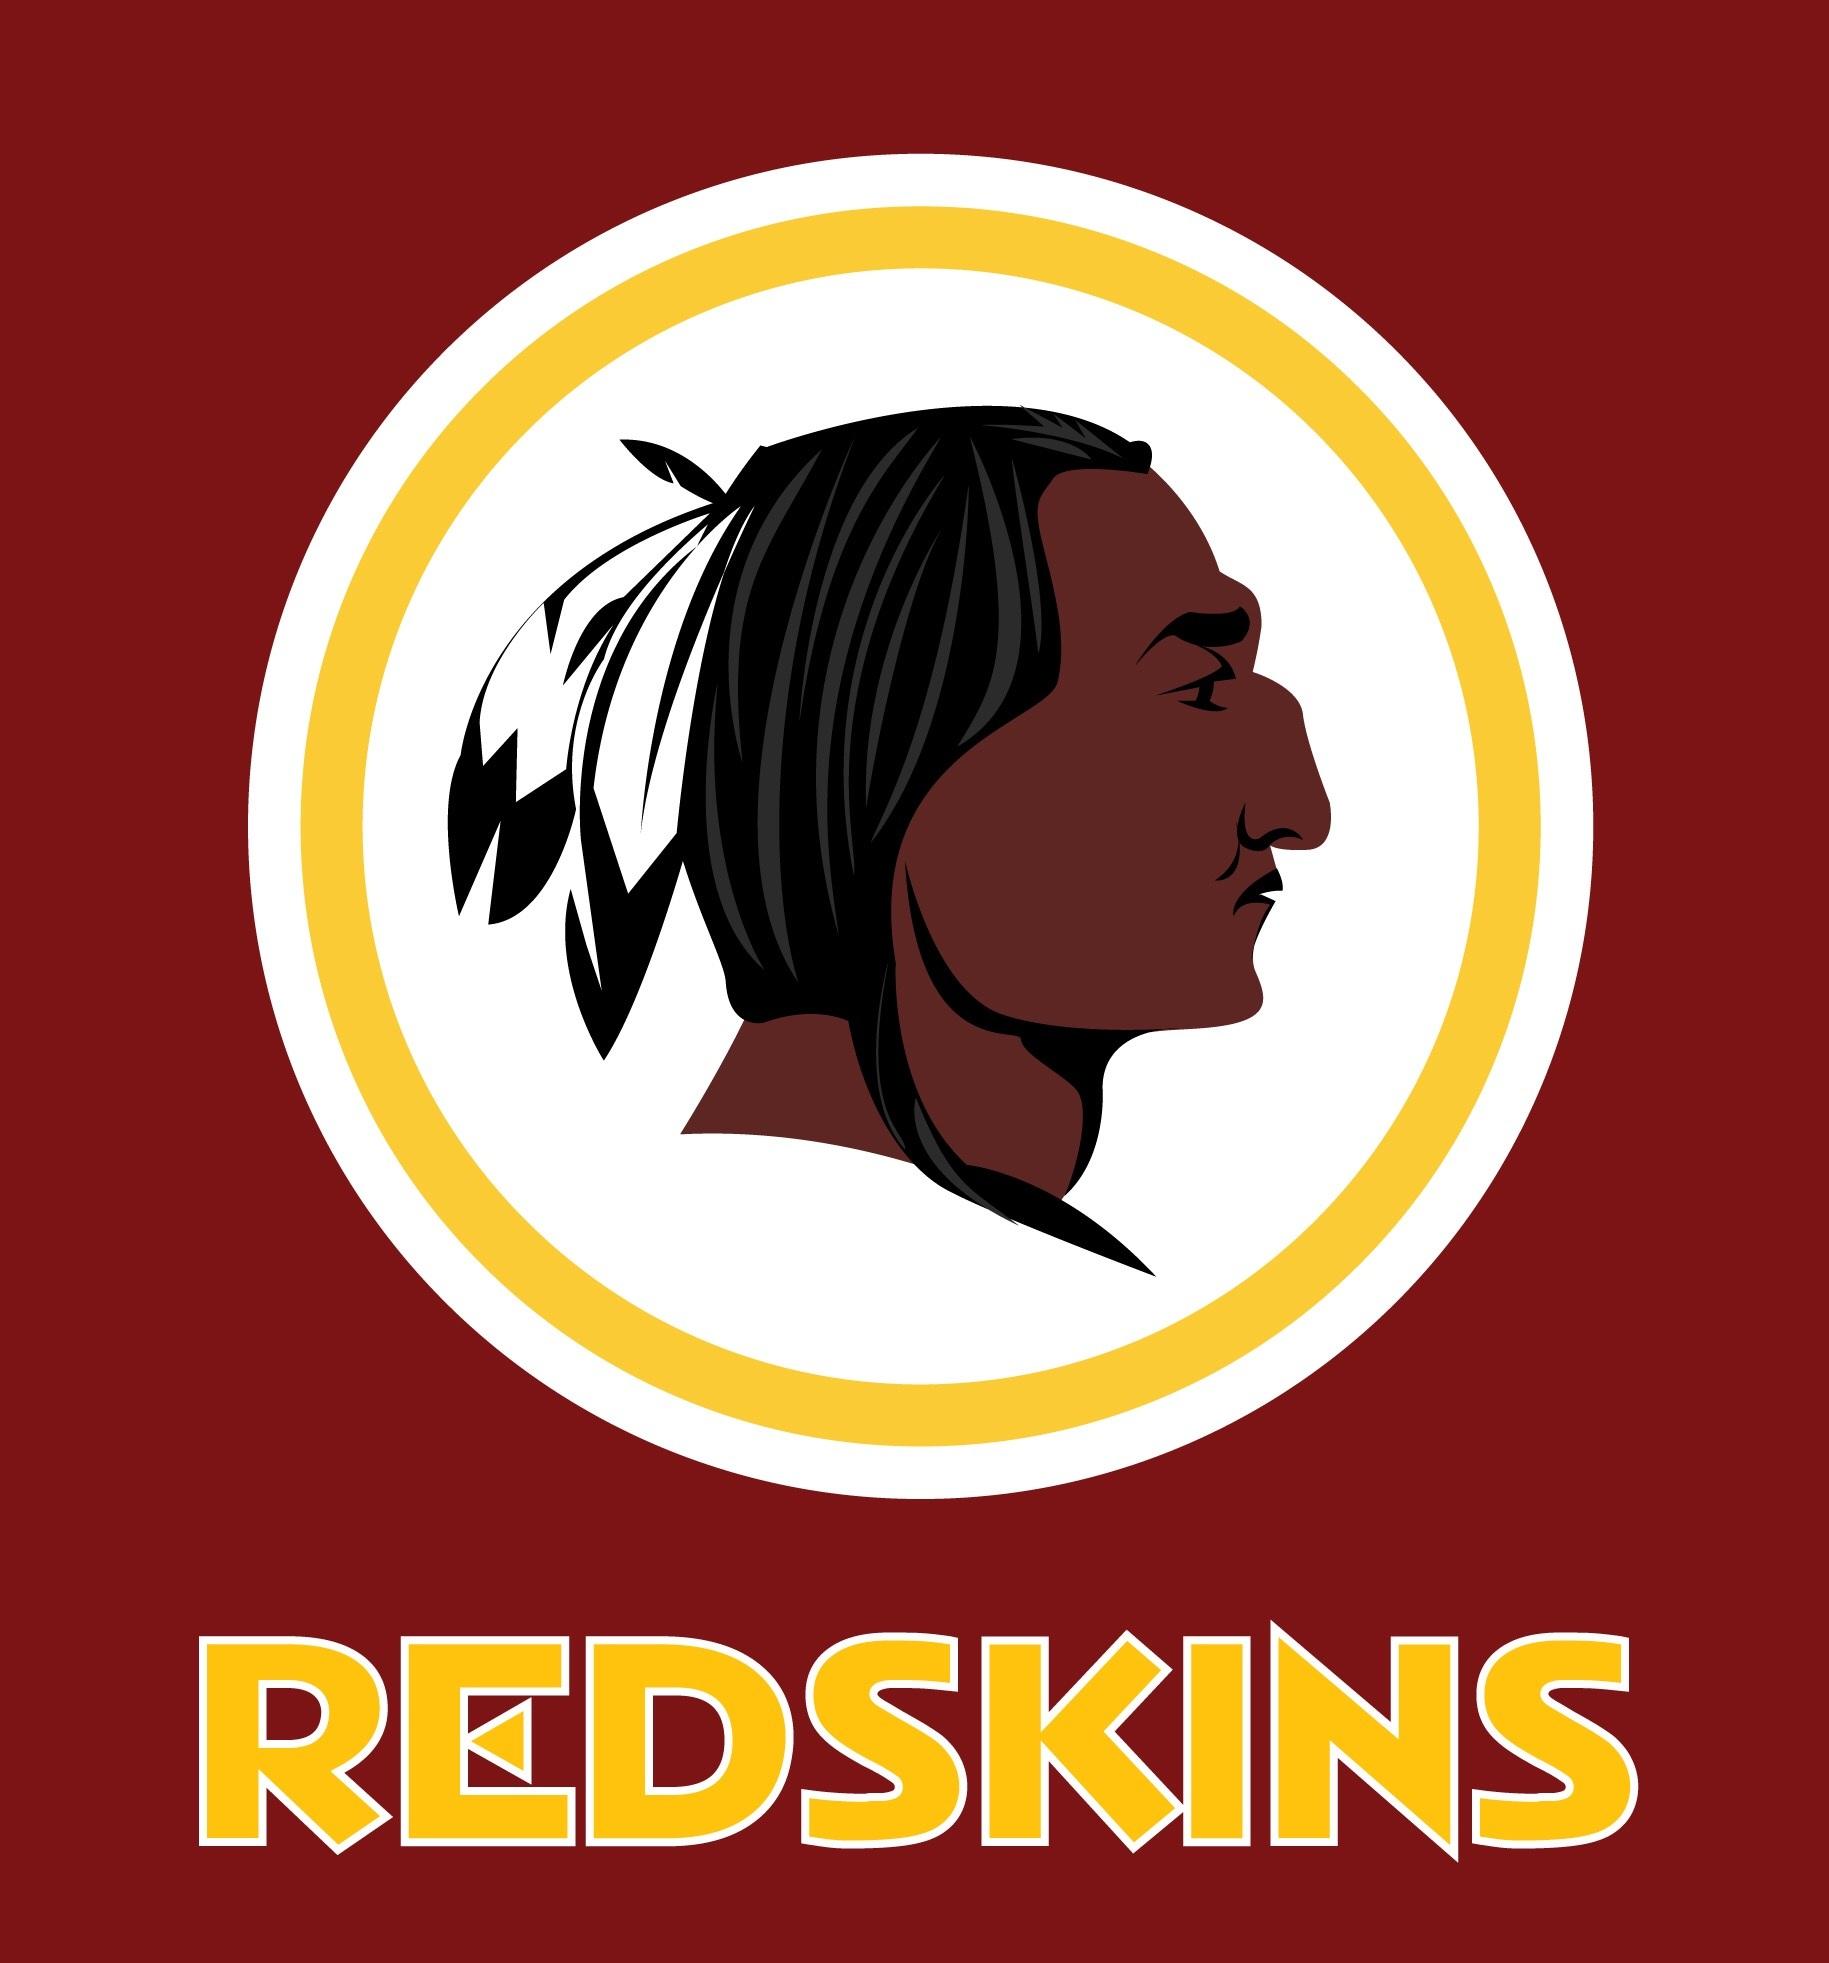 Joshua+Sandoval_Redskins.jpg